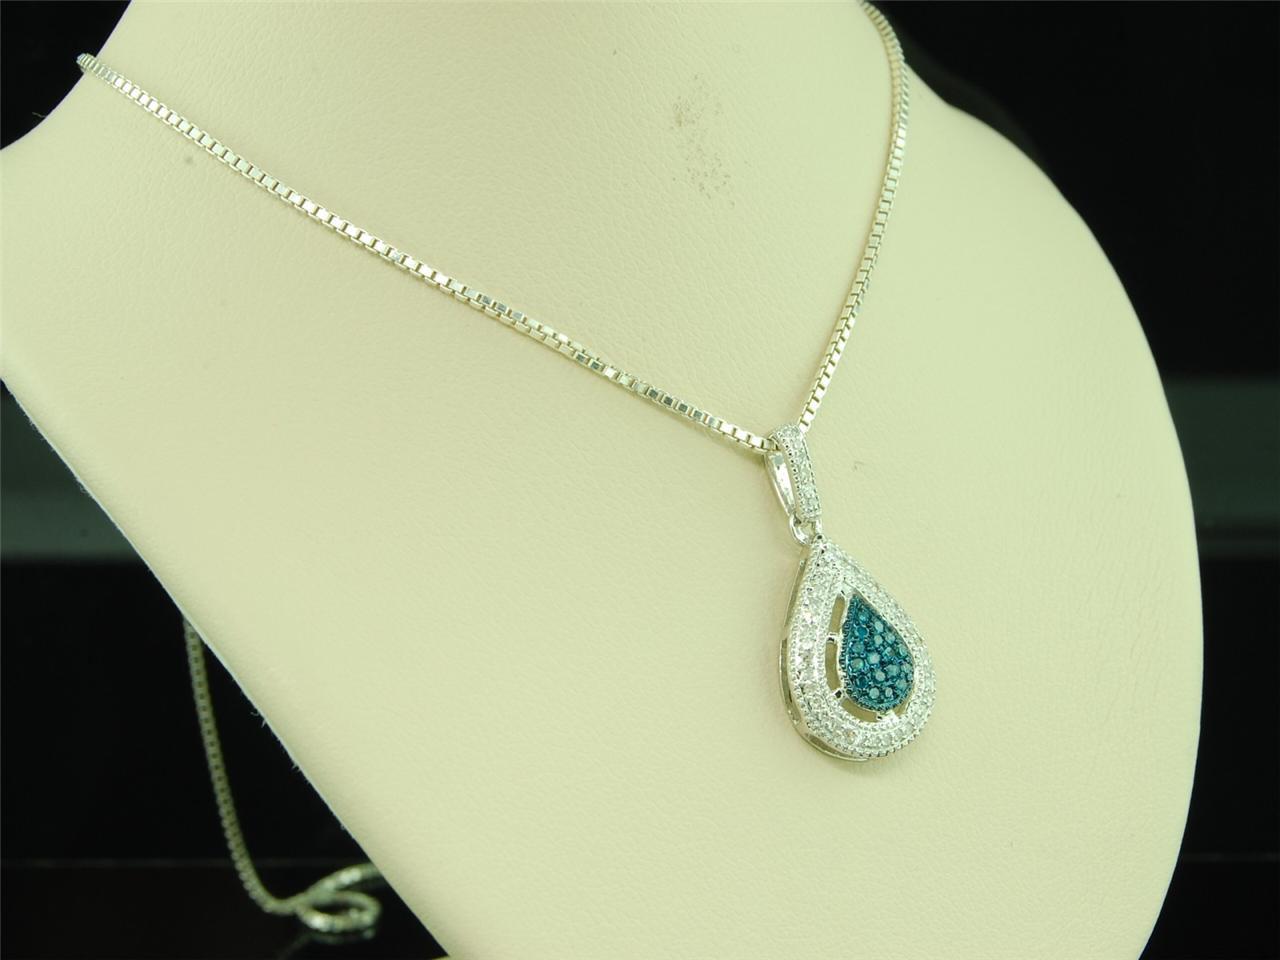 Gold Blue Diamond Teardrop Pendant Charm for Necklace 0 21 Ct